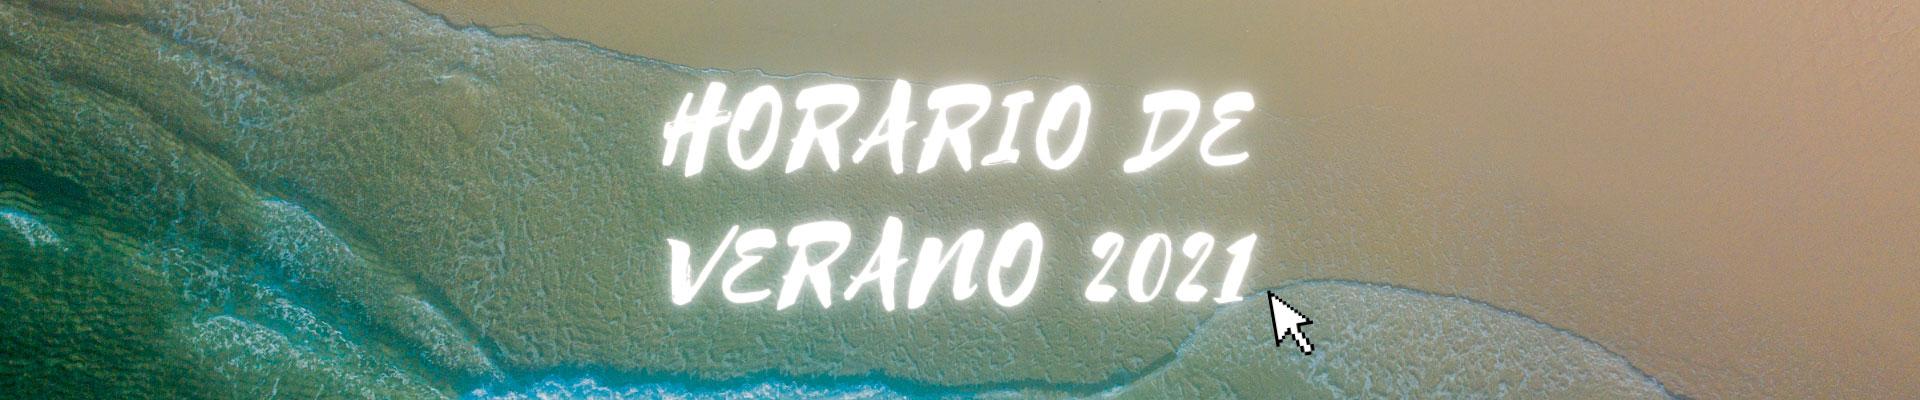 HORARIO-DE-VERANO-2021-banner-largo